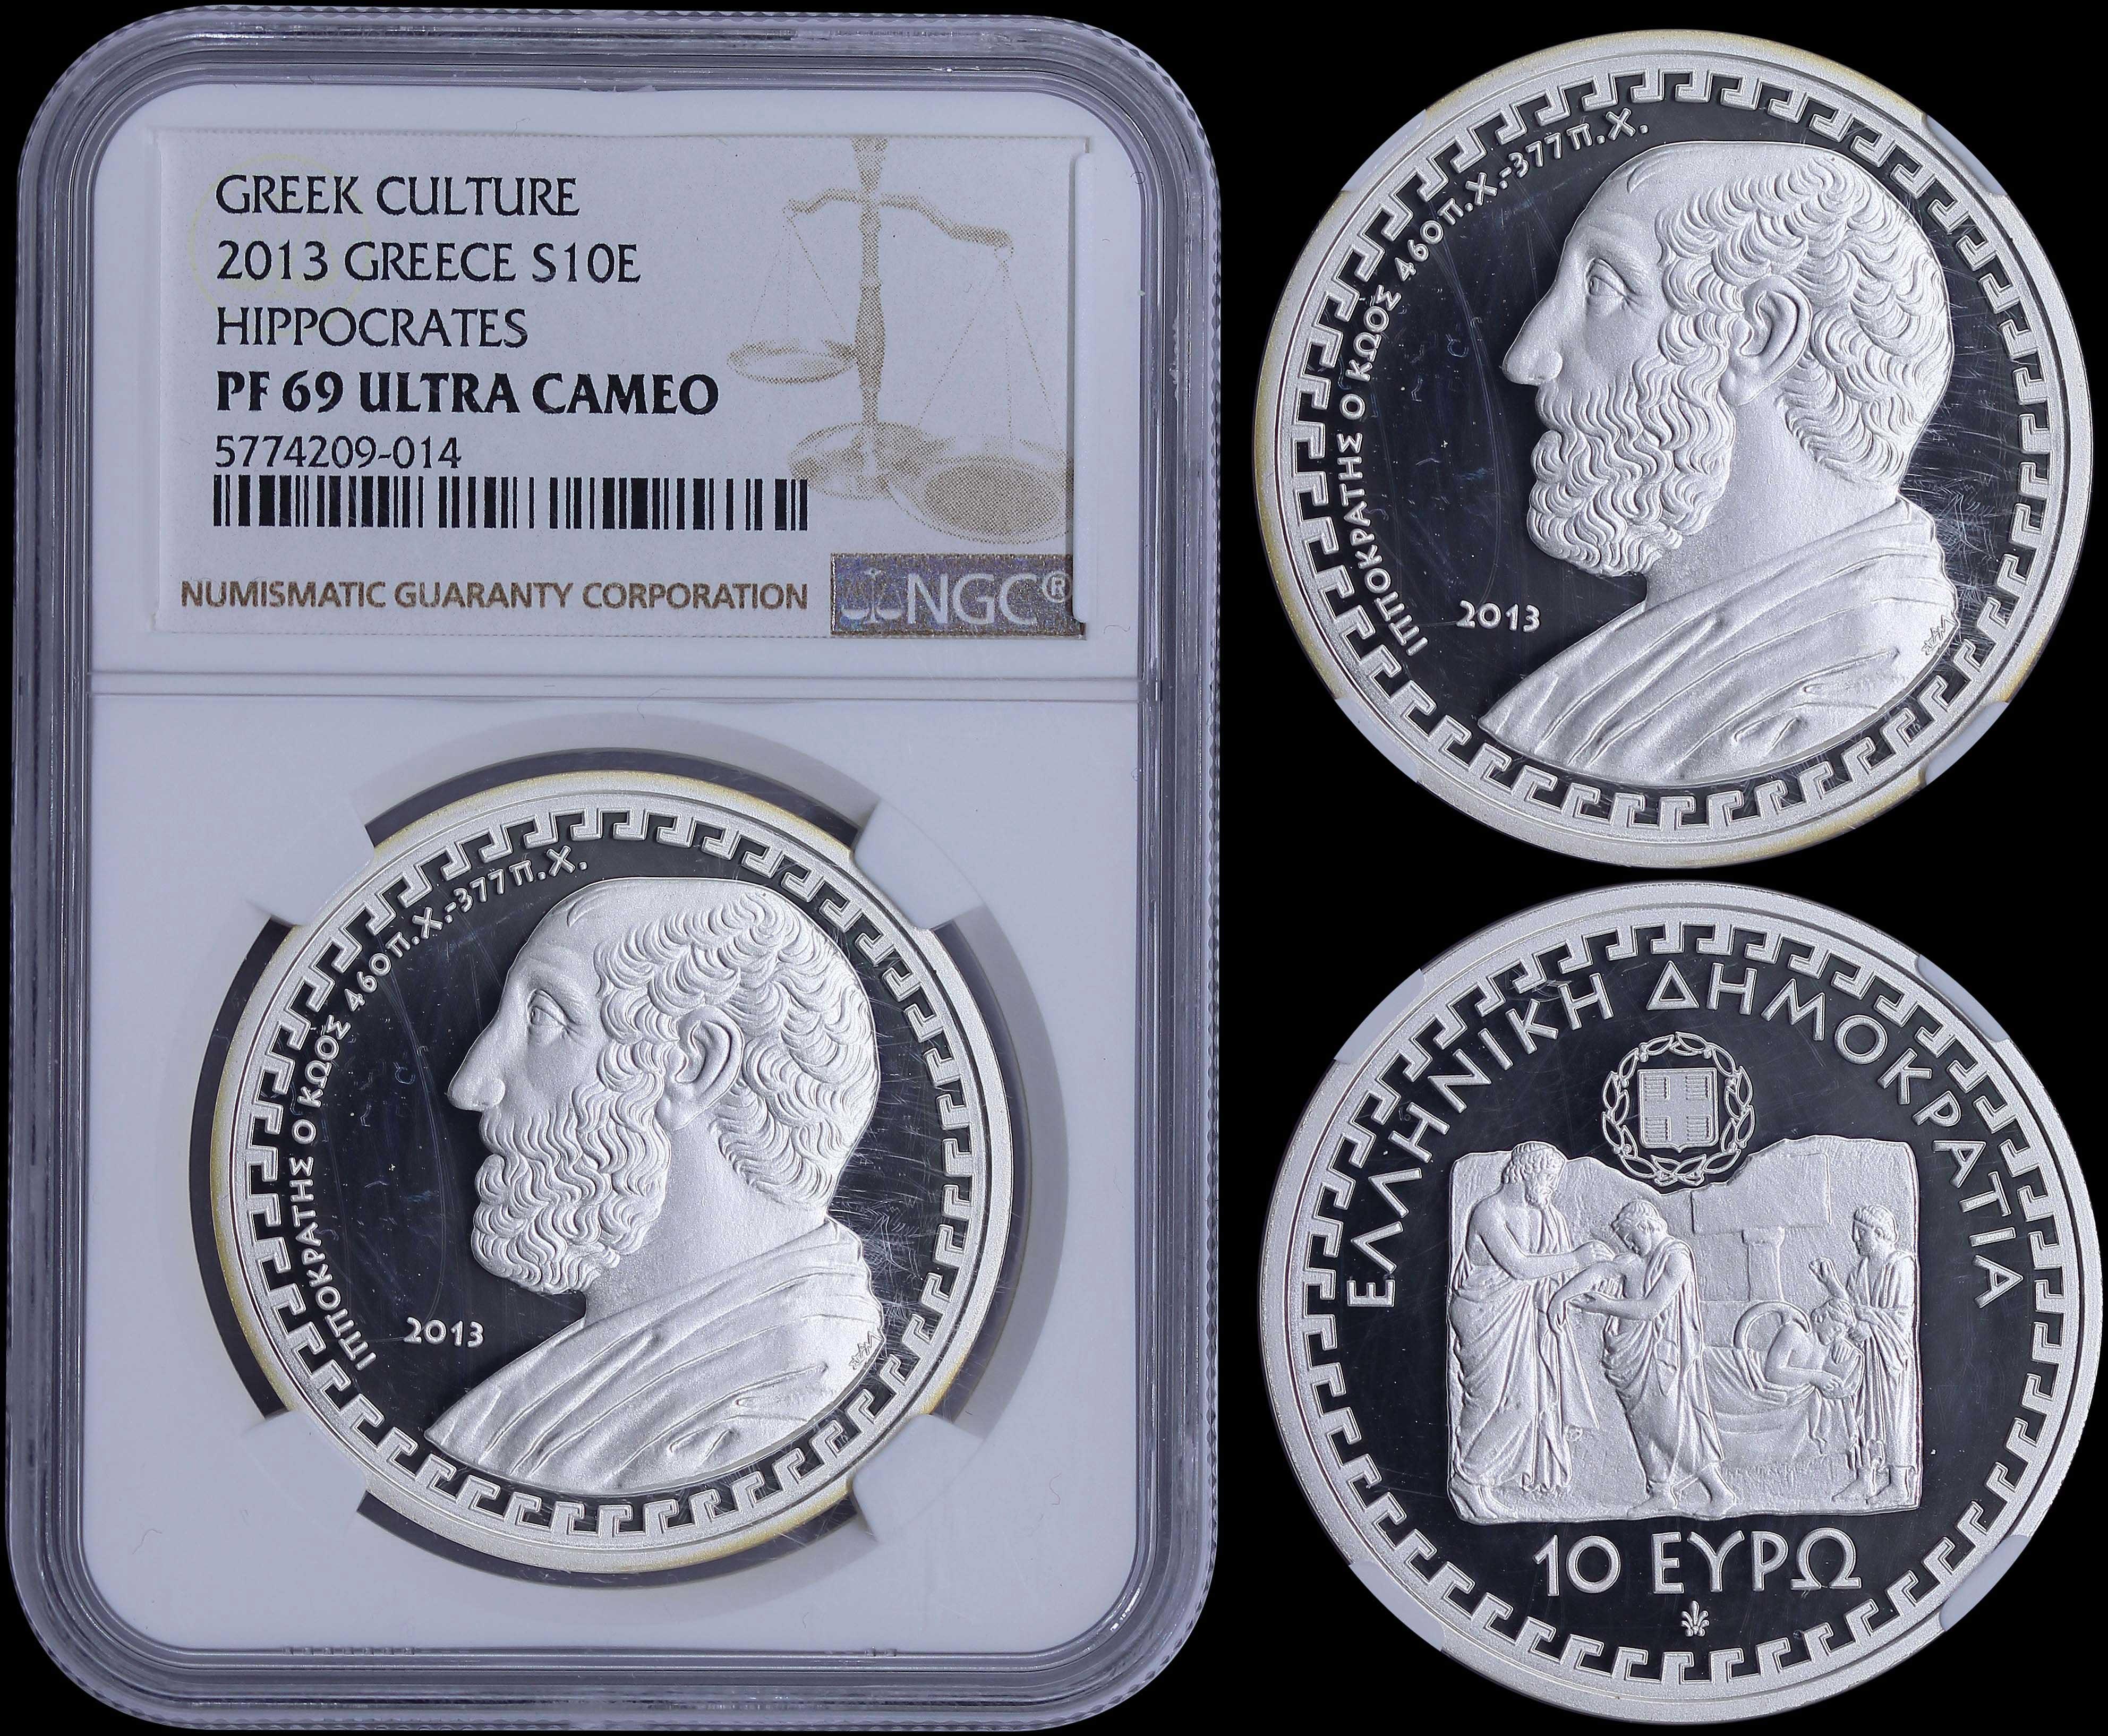 Lot 6227 - -  COINS & TOKENS HELLENIC REPUBLIC & COMMEMORATIVE ISSUES -  A. Karamitsos Public & Live Internet Auction 665 Coins, Medals & Banknotes